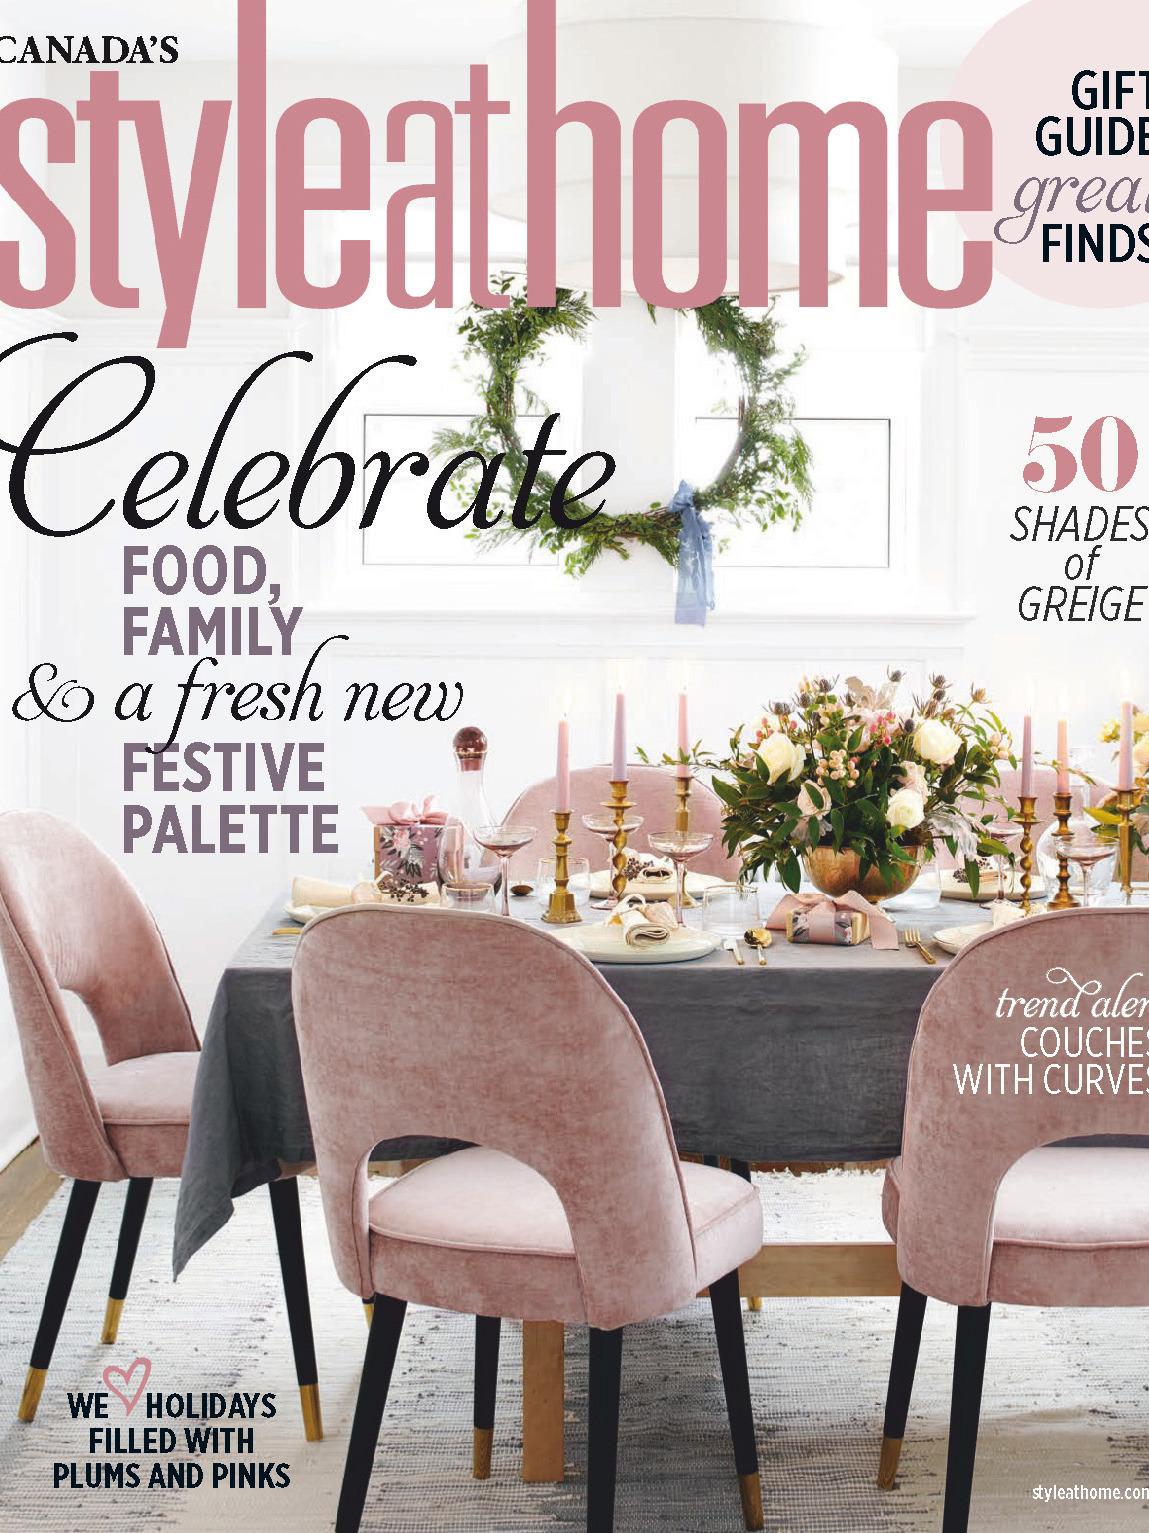 《Style at Home》加拿大版时尚家居杂志2019年11月号